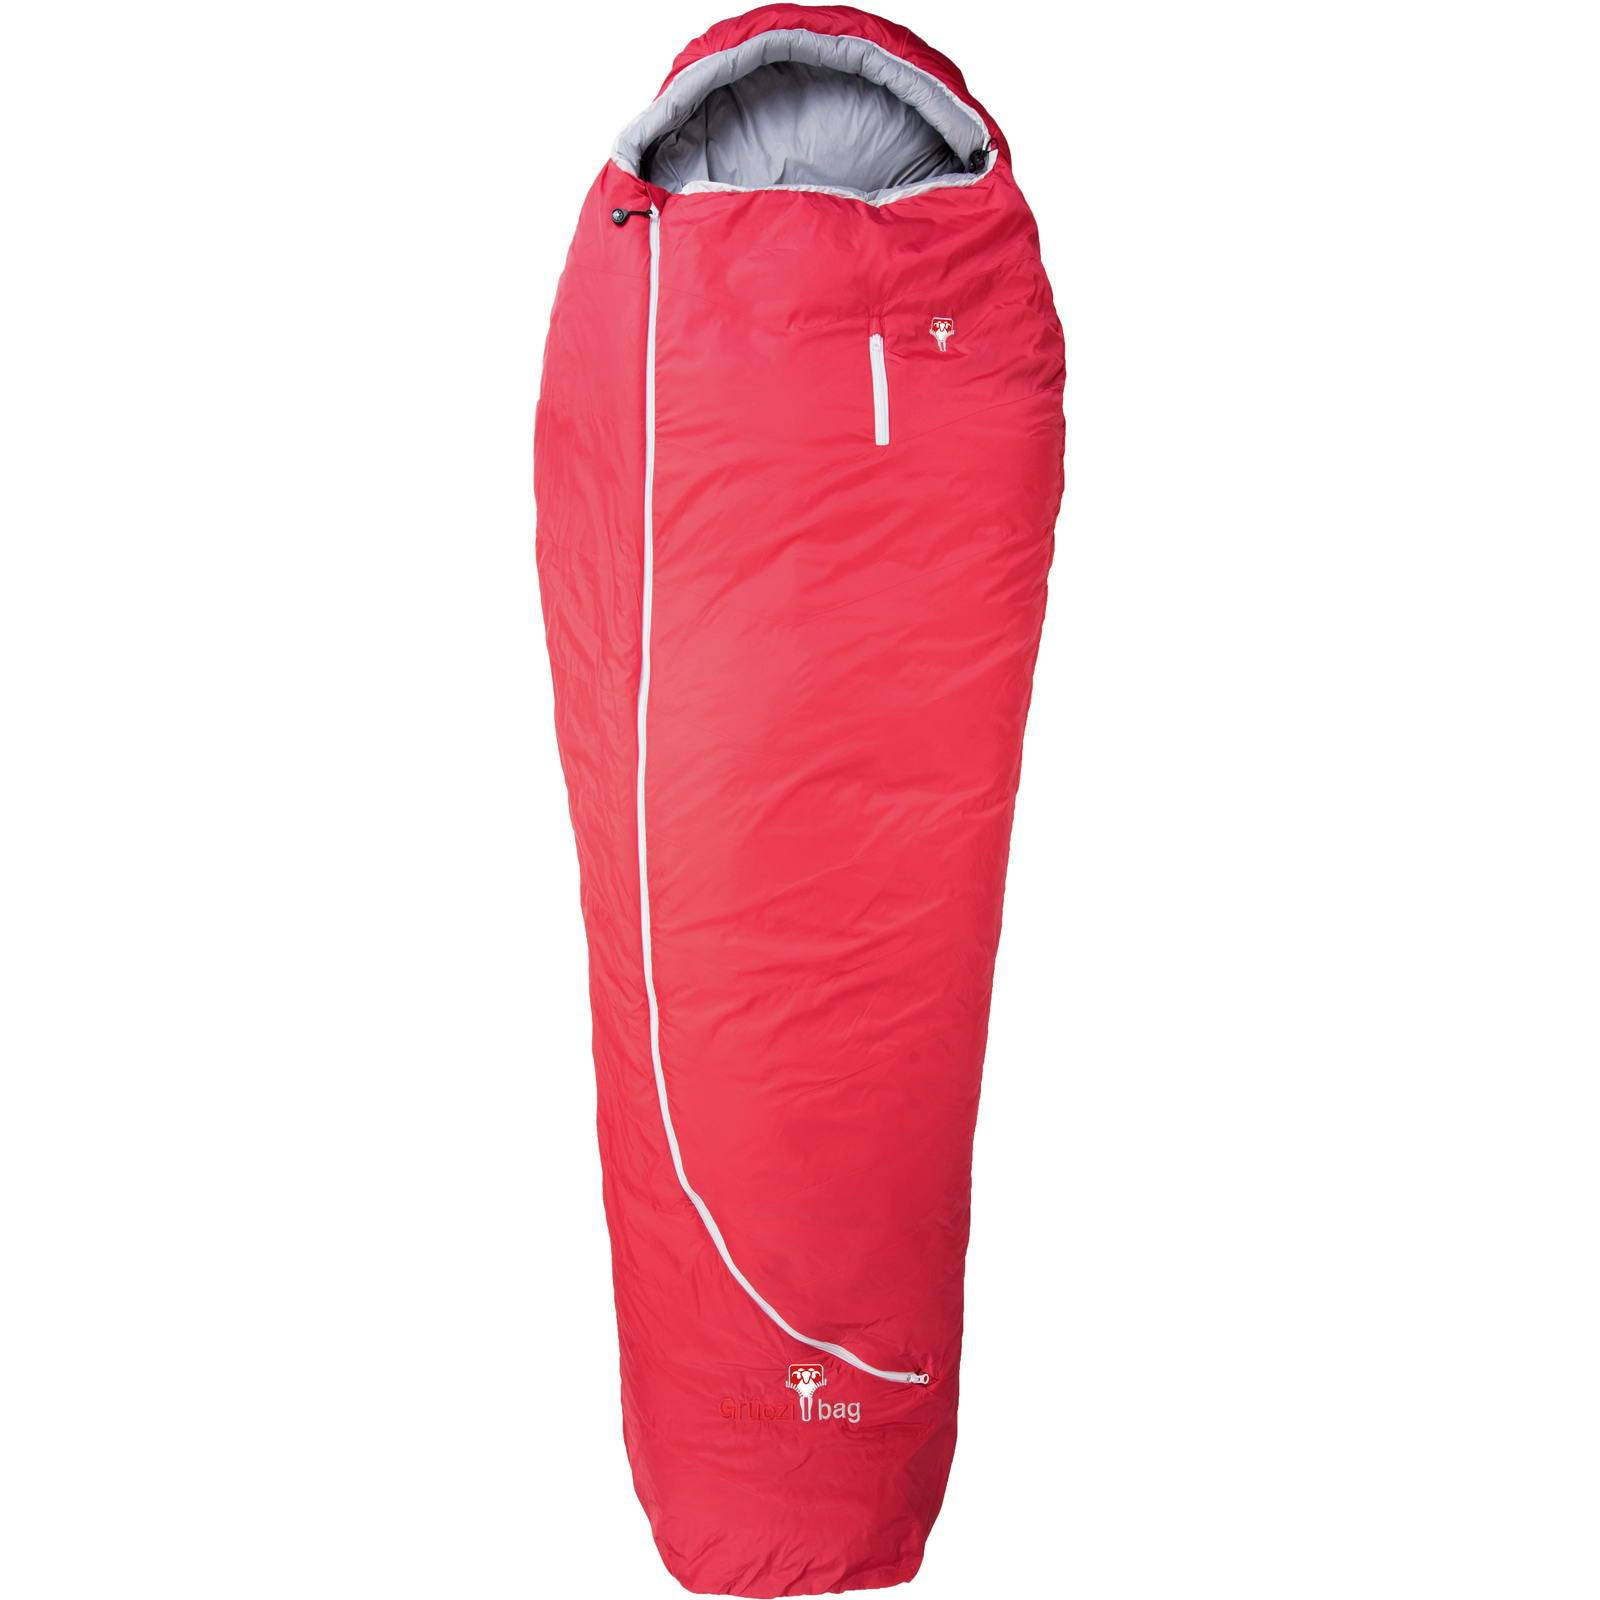 Grüezi Bag Biopod Wolle Zero XL - Wollschlafsack tango red - Bild 1